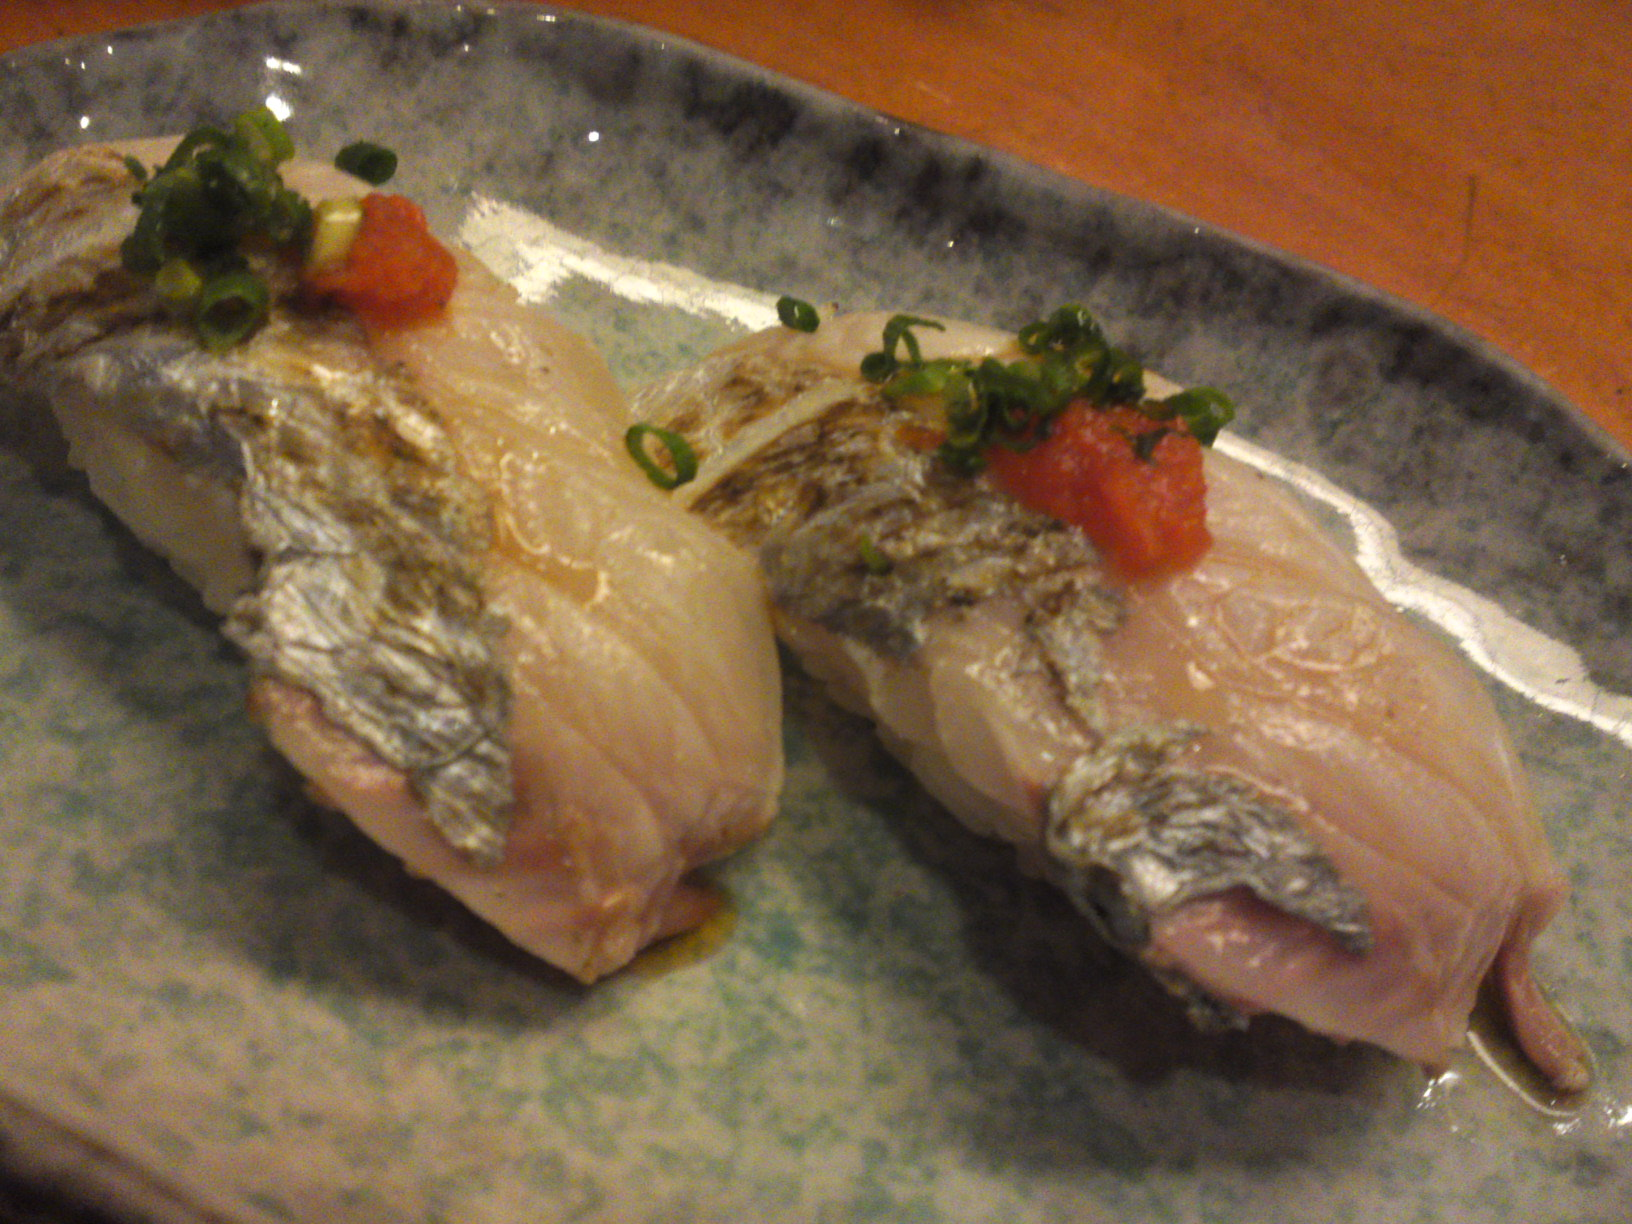 Red king crab shizuoka sushi sashimi the other jewels for Fish for sushi